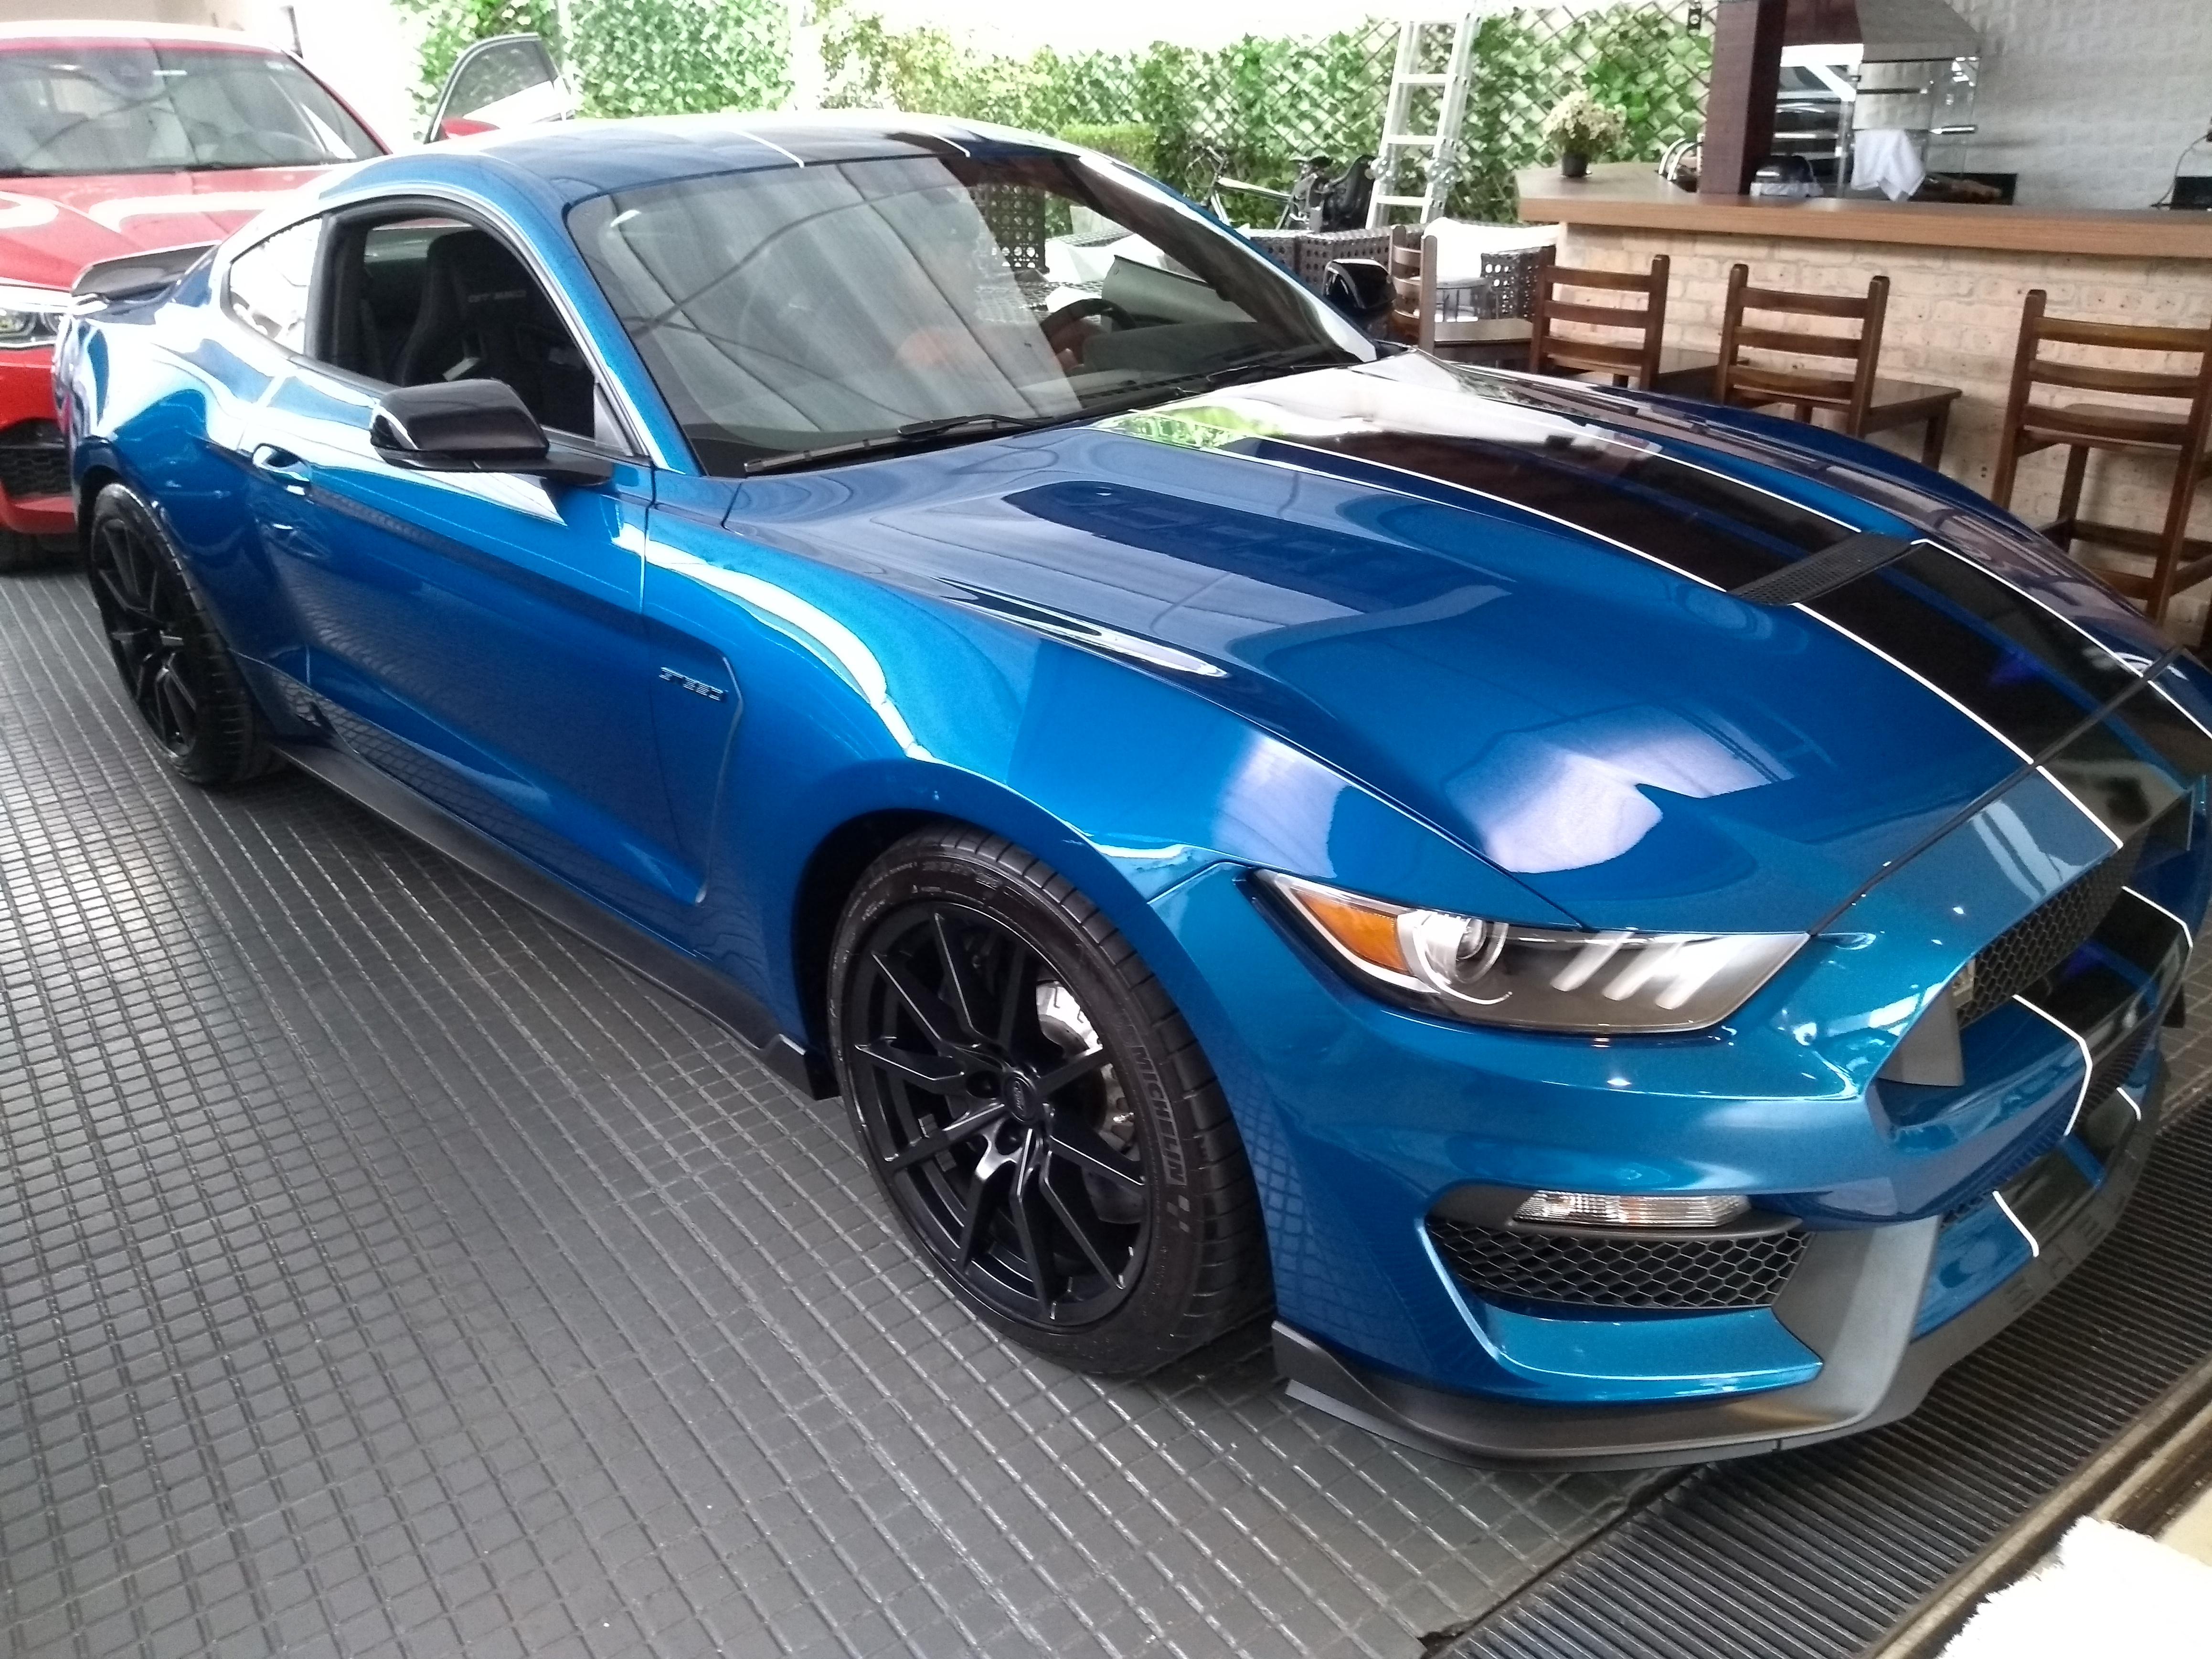 Mustang Shelby Gt350 zero km